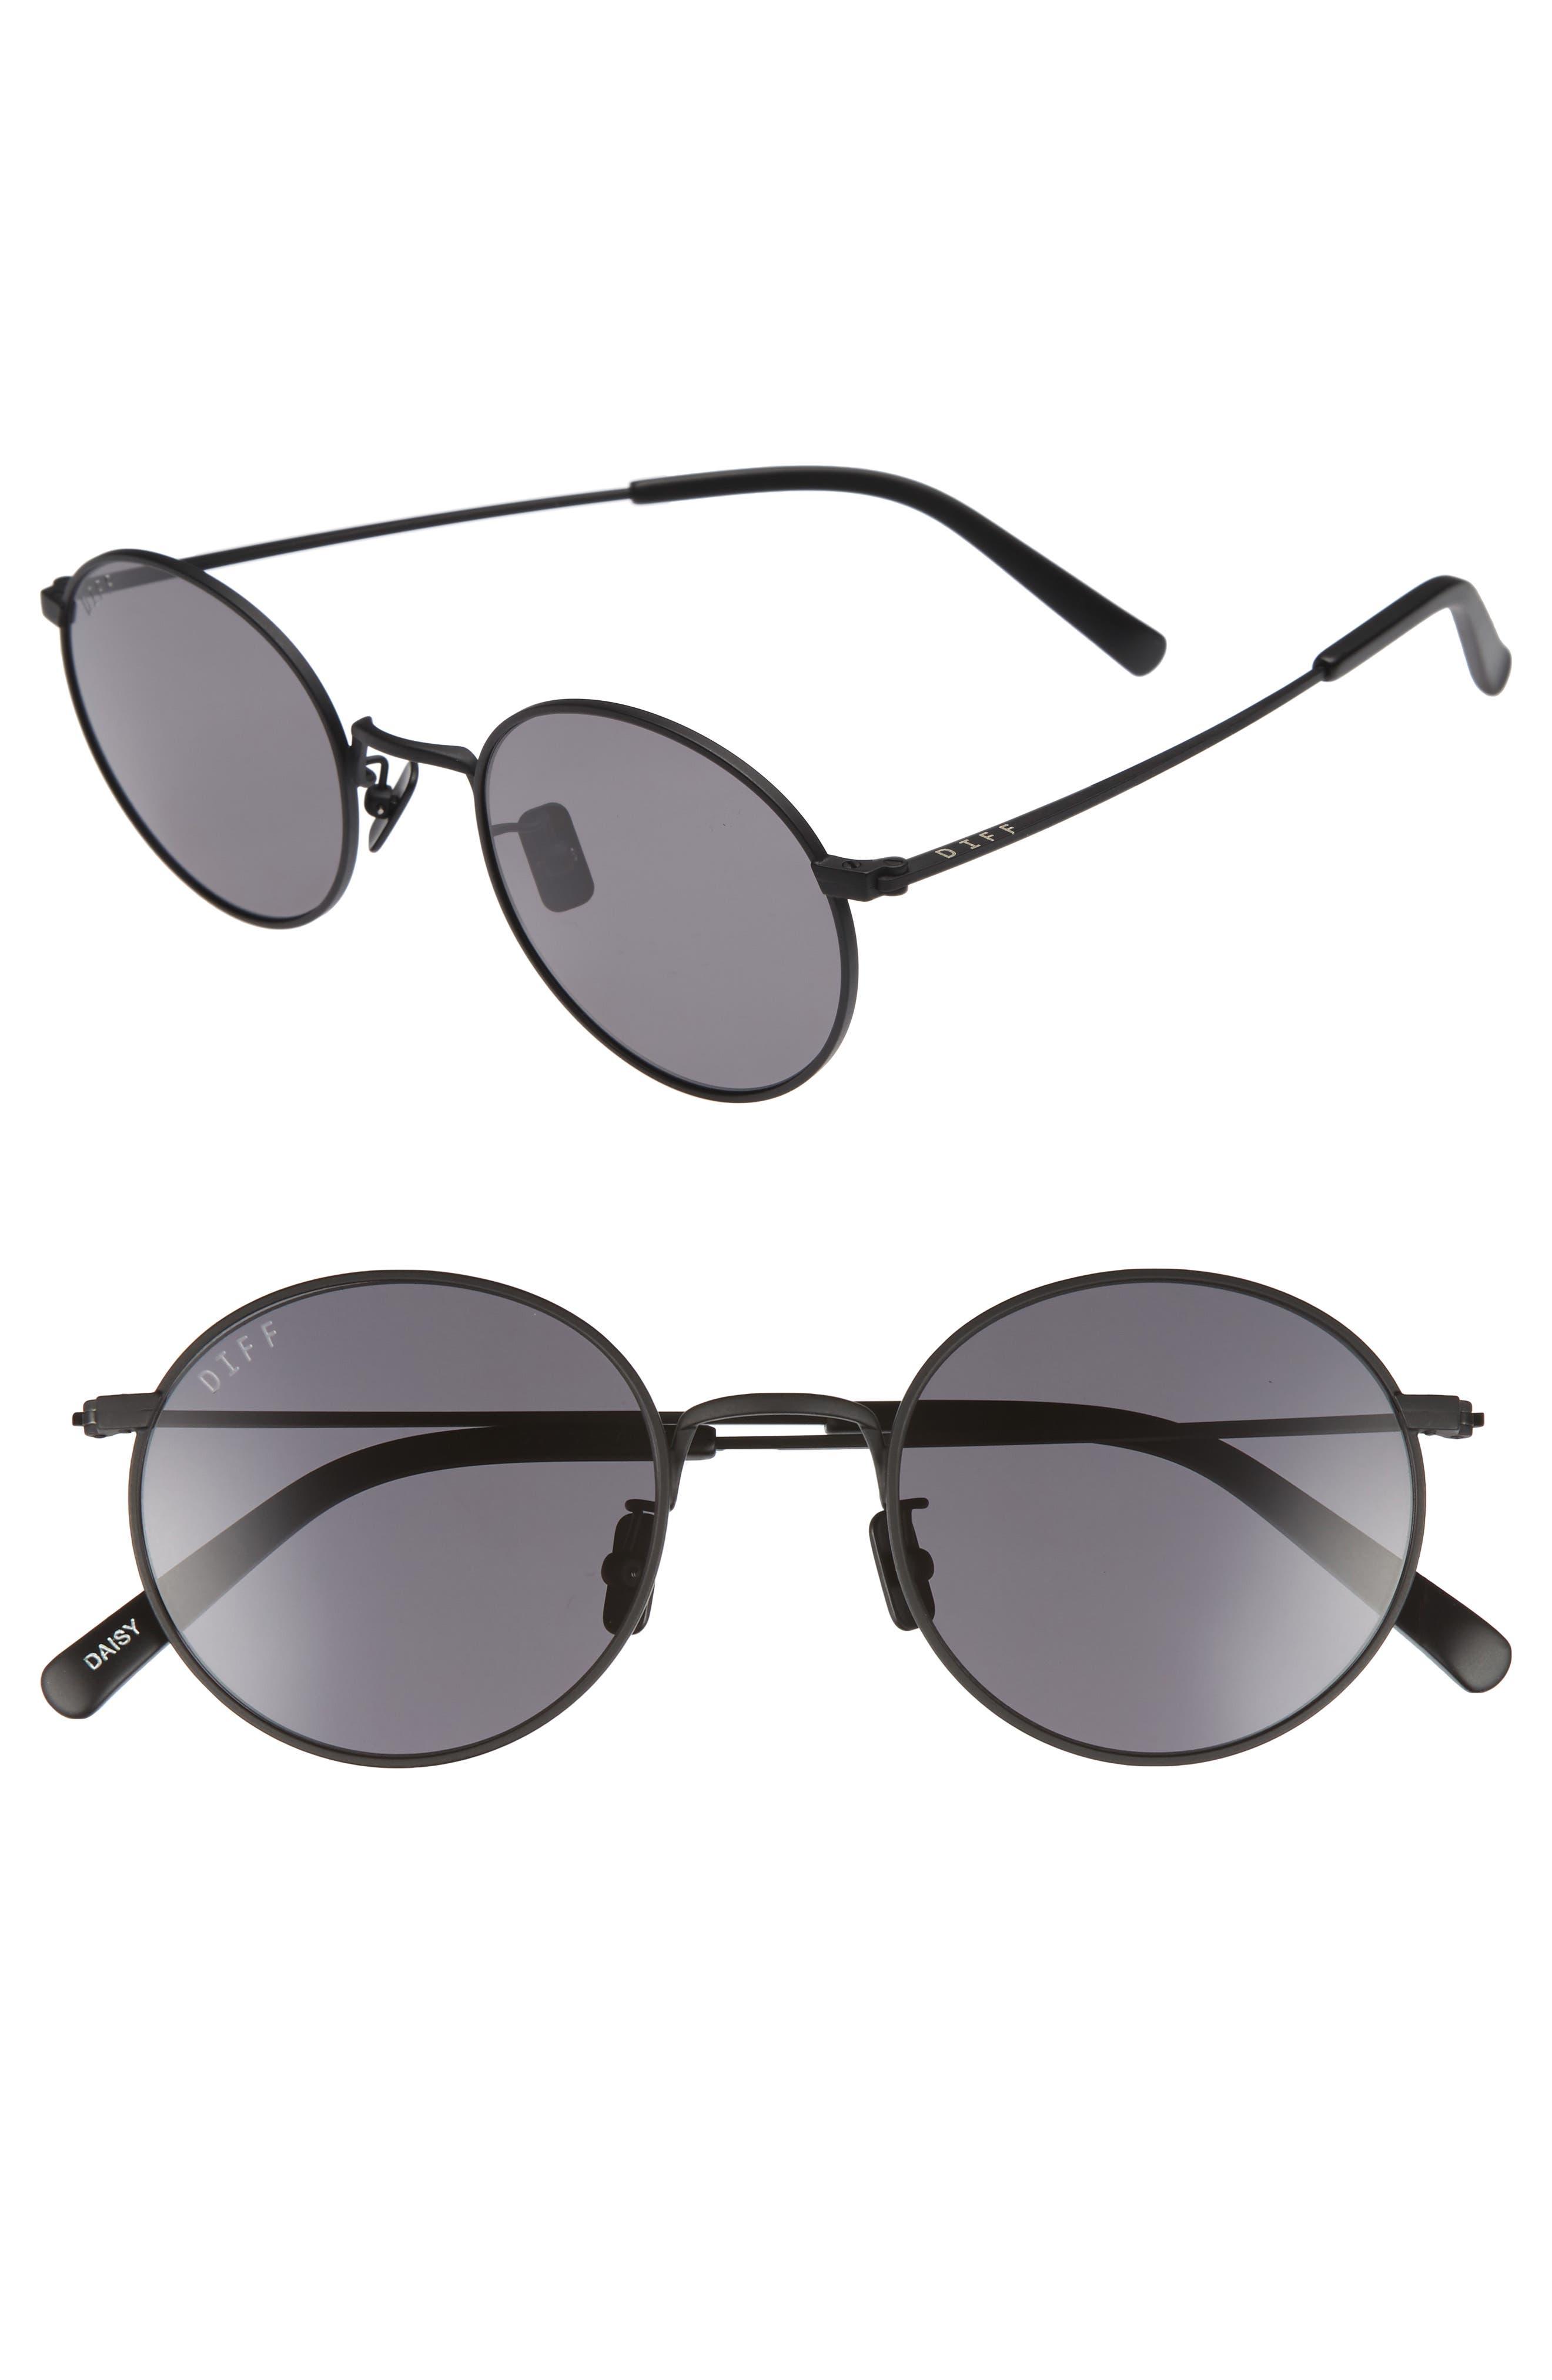 Main Image - DIFF Daisy 51mm Round Sunglasses